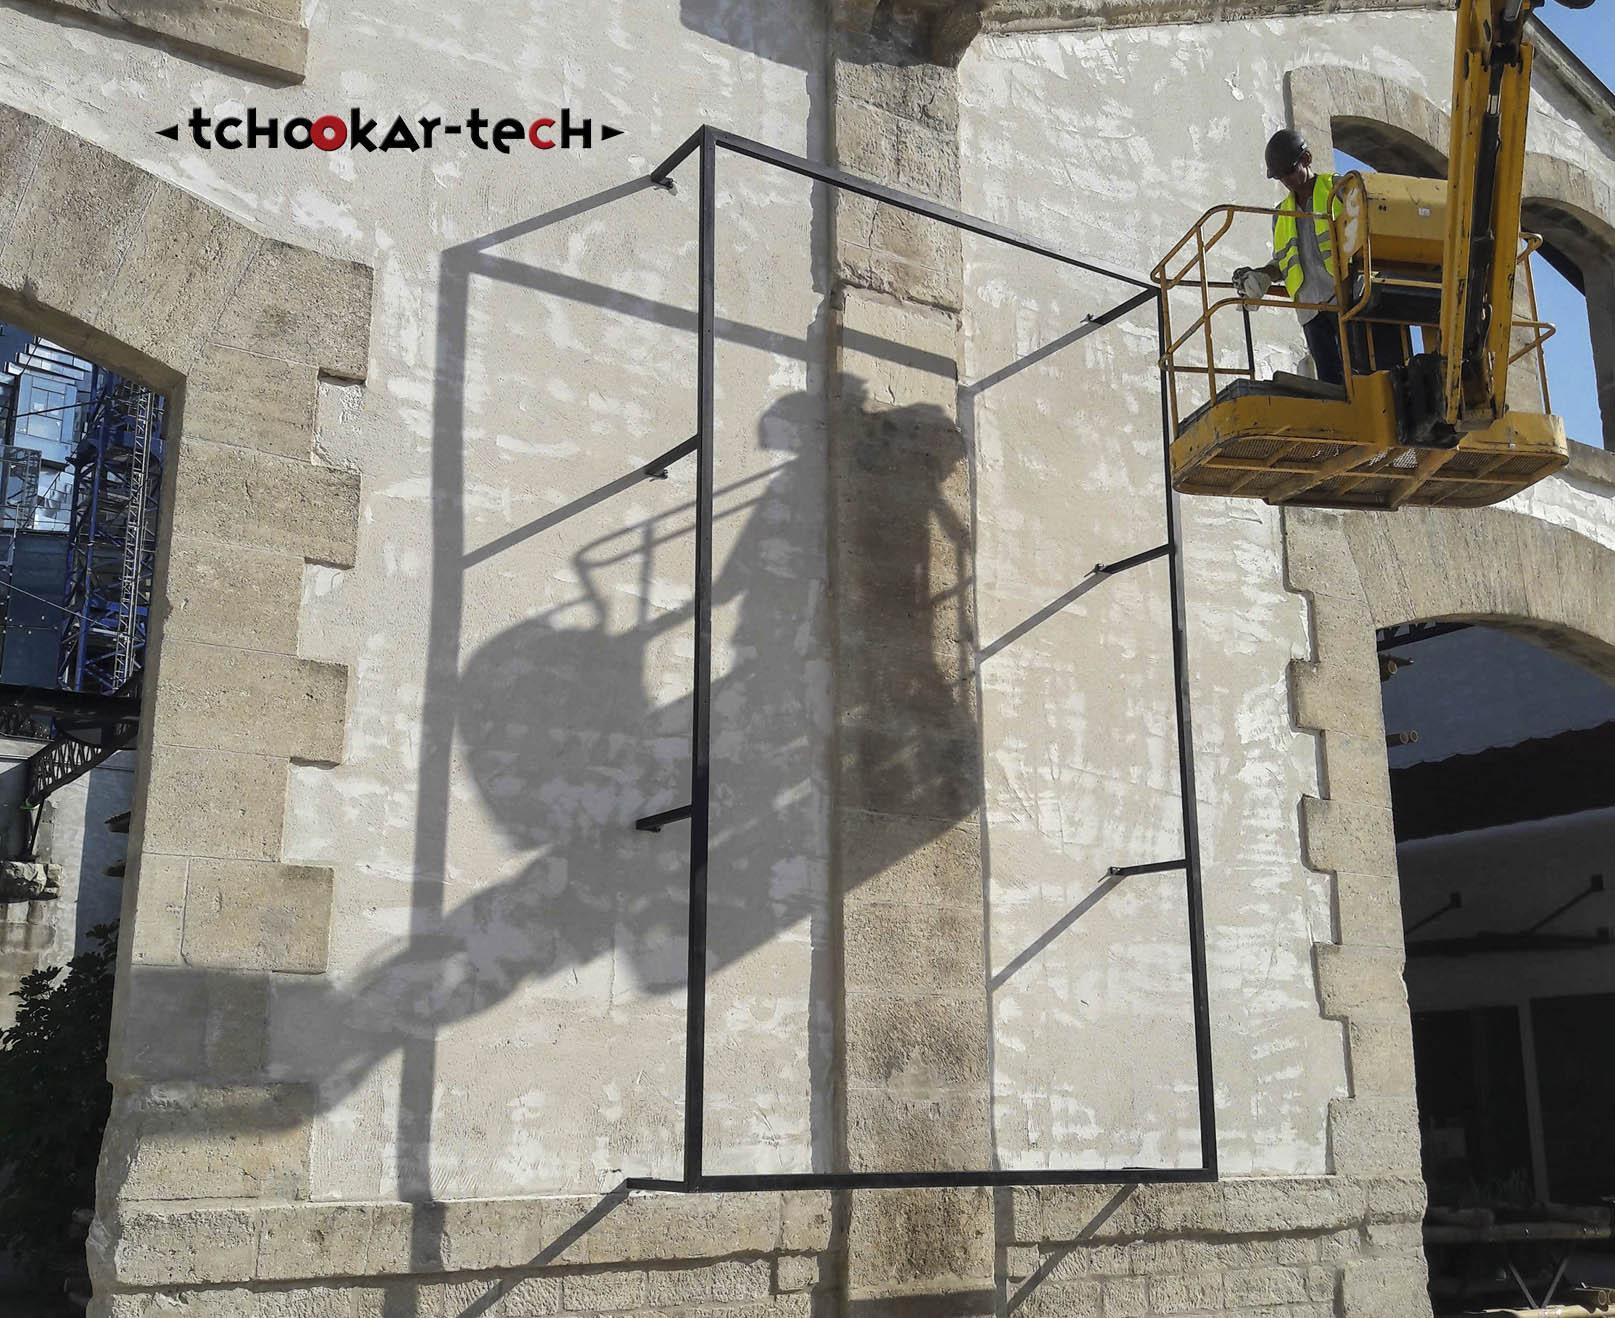 Comception et pose cadre affichage - Fondation LUMA - Arles